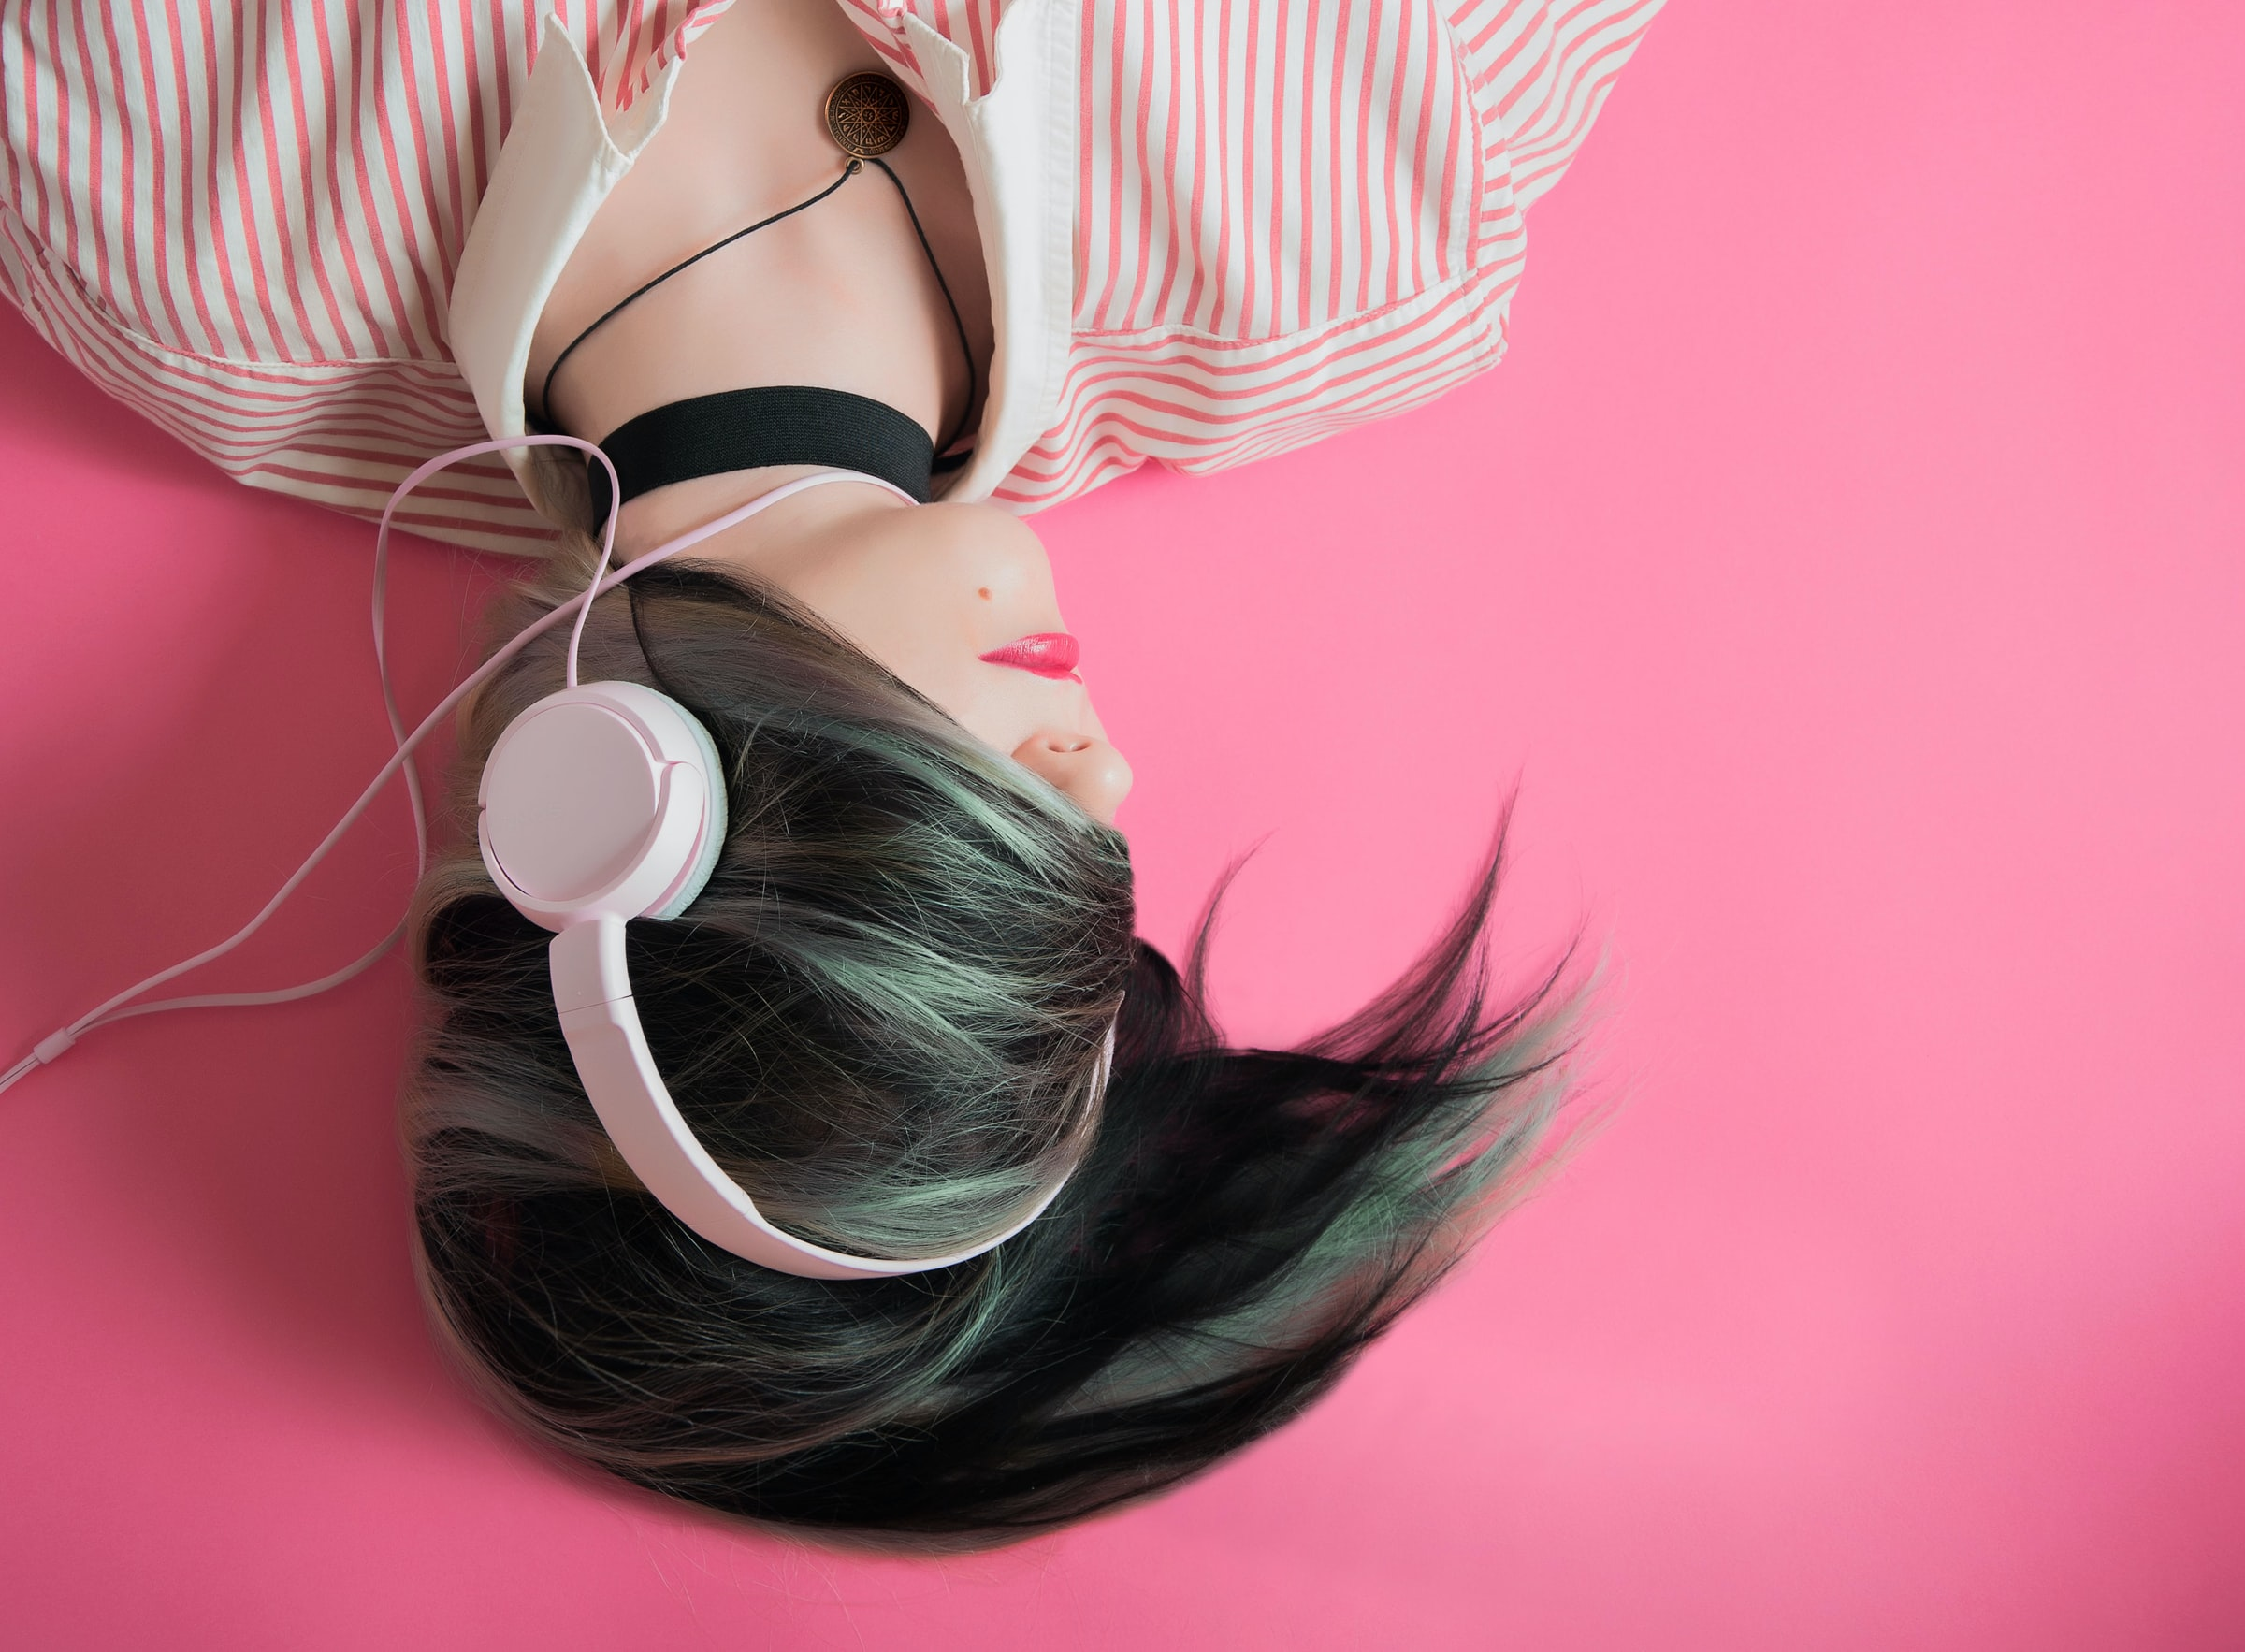 Chica utilizando auriculares de diadema sobre fondo rosa